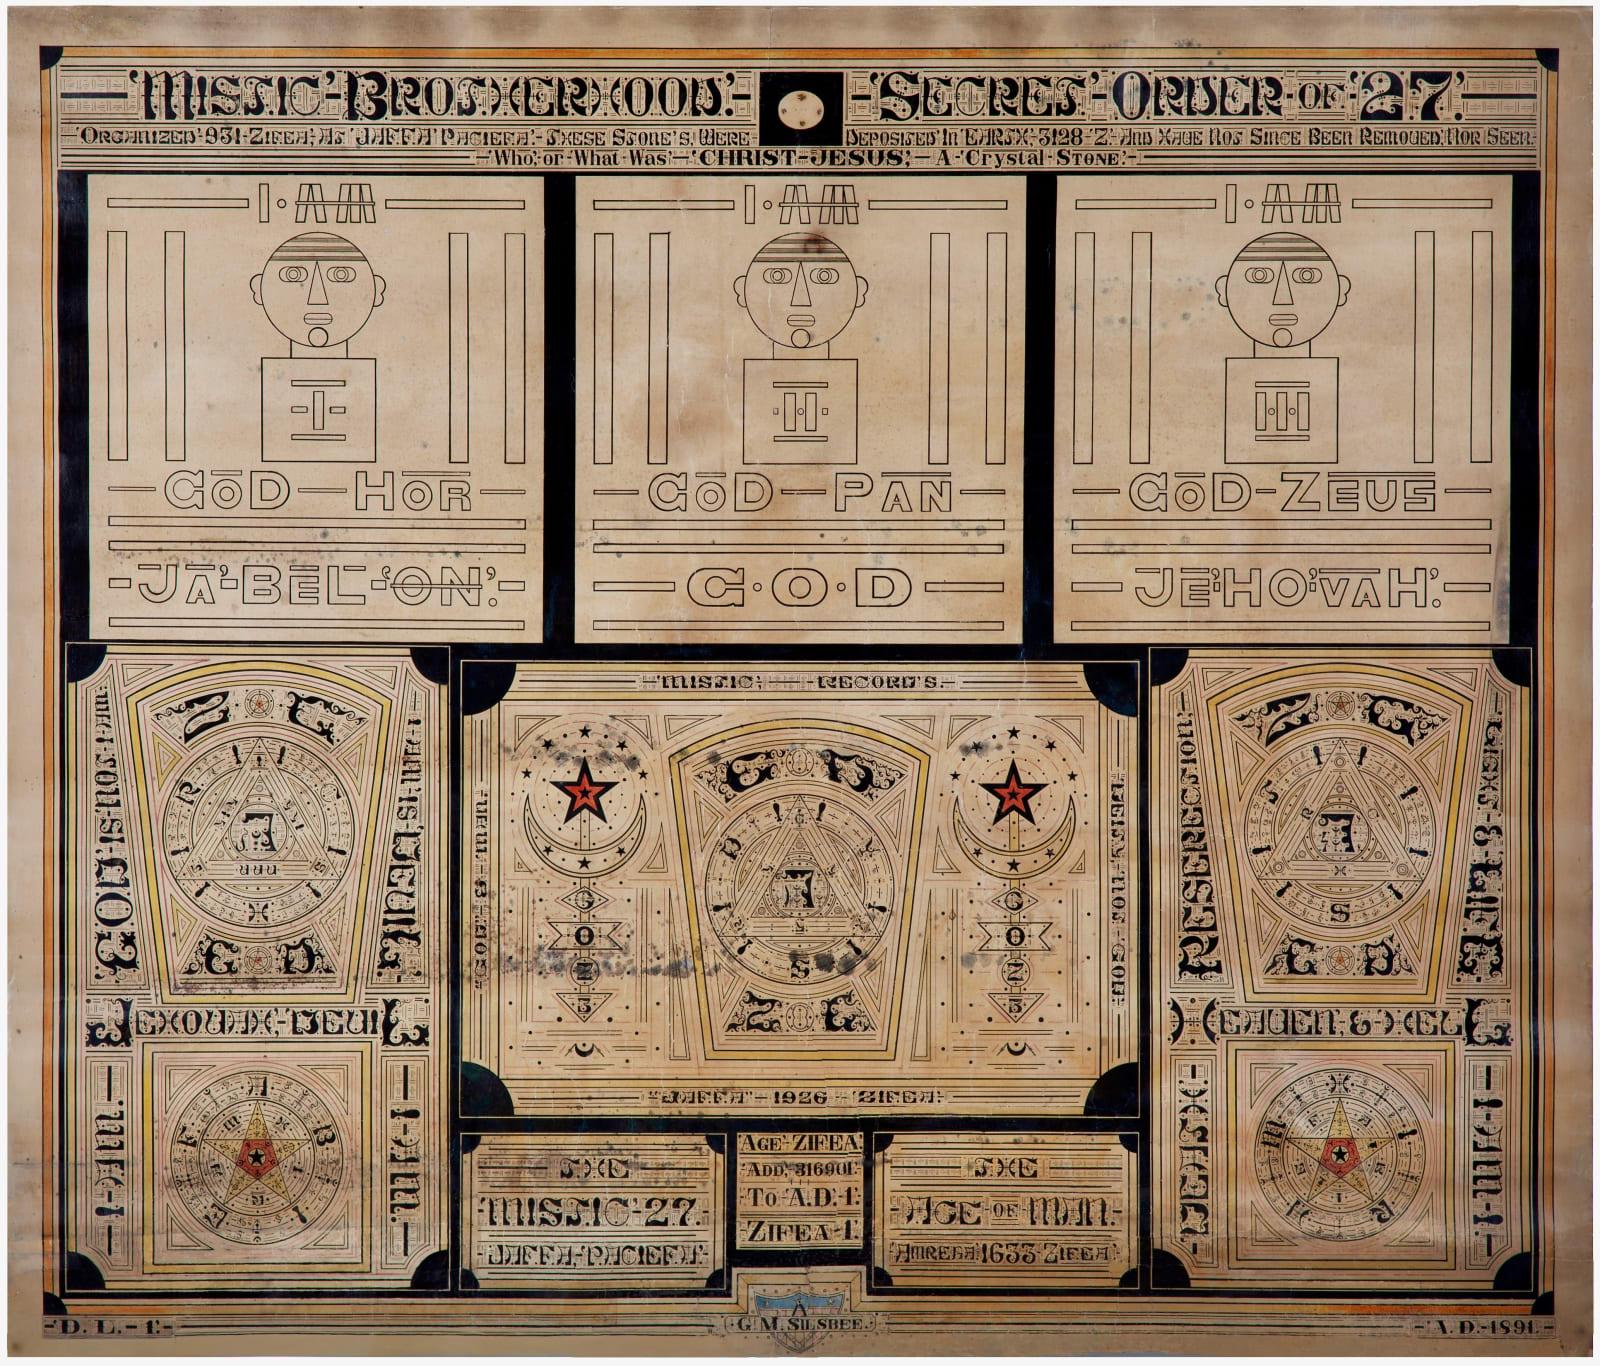 Mistic Brotherhoods Secret Order of 27, ca. 1891 Ink on paper 41 1/4 x 35 1/2 in. 104.8 x 90.2 cm. (GMS8)